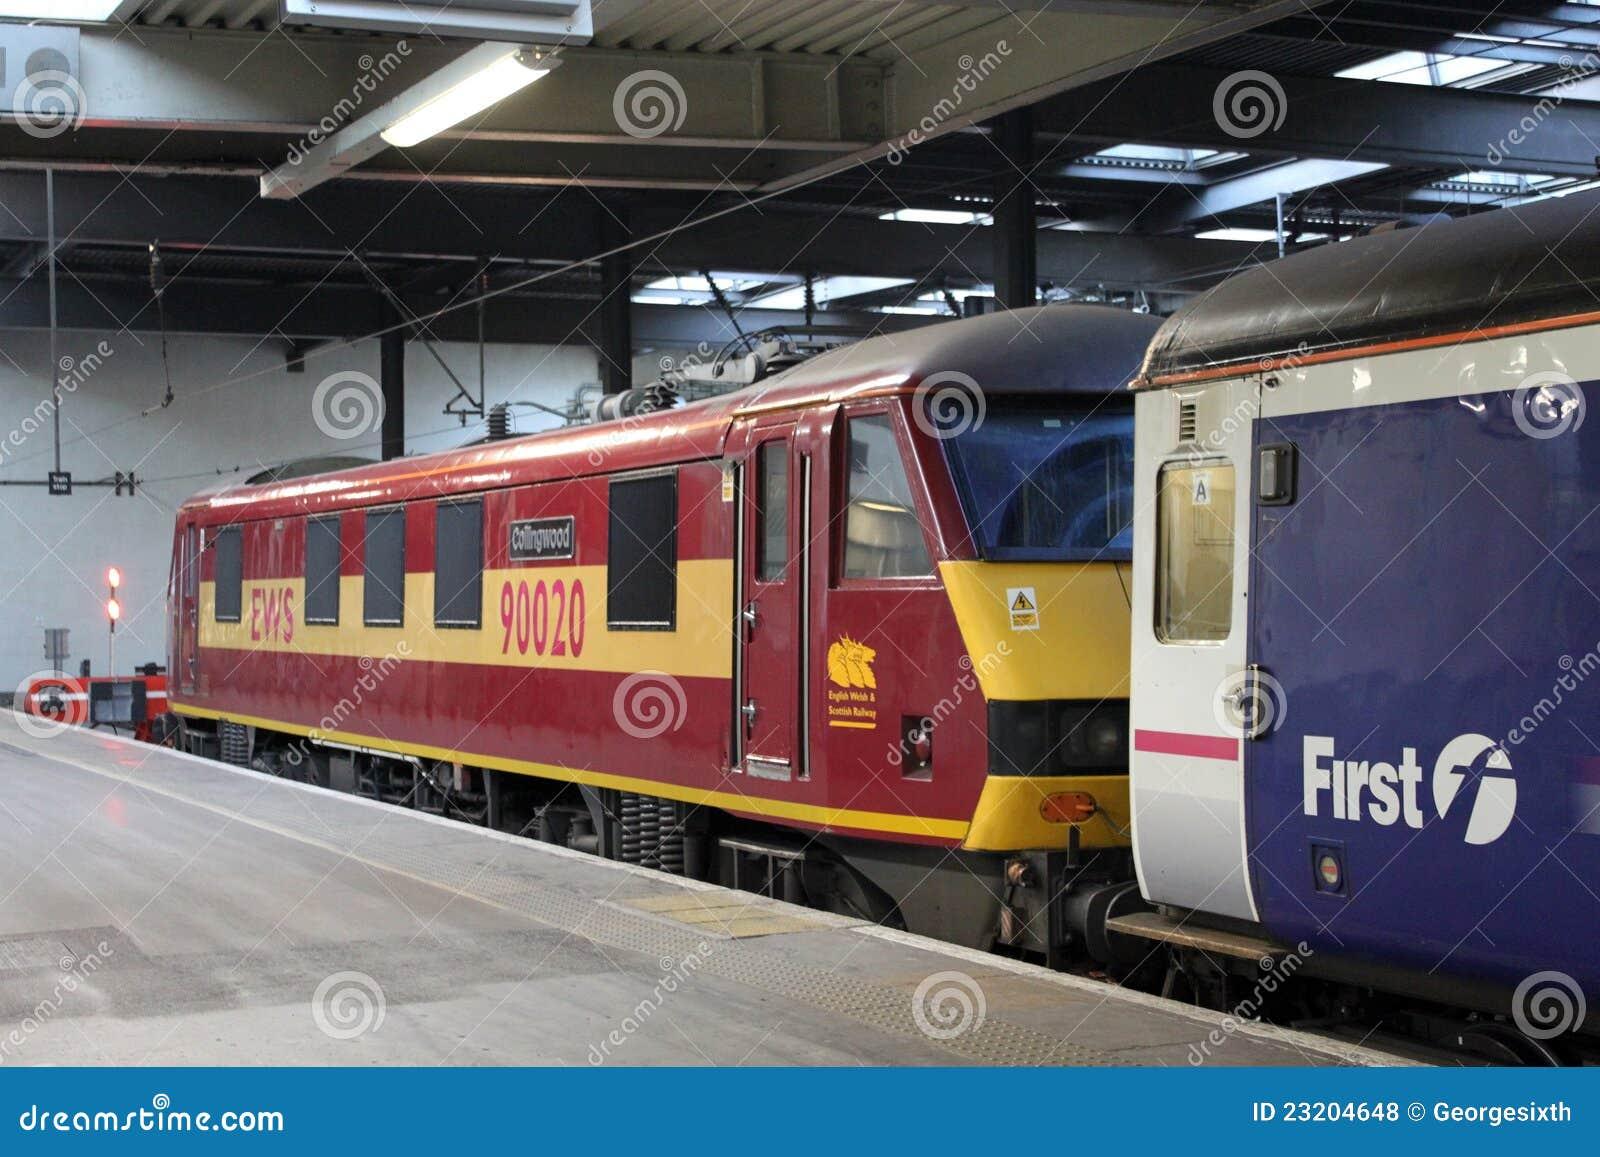 Caledonian Sleeper Train At London Euston Station